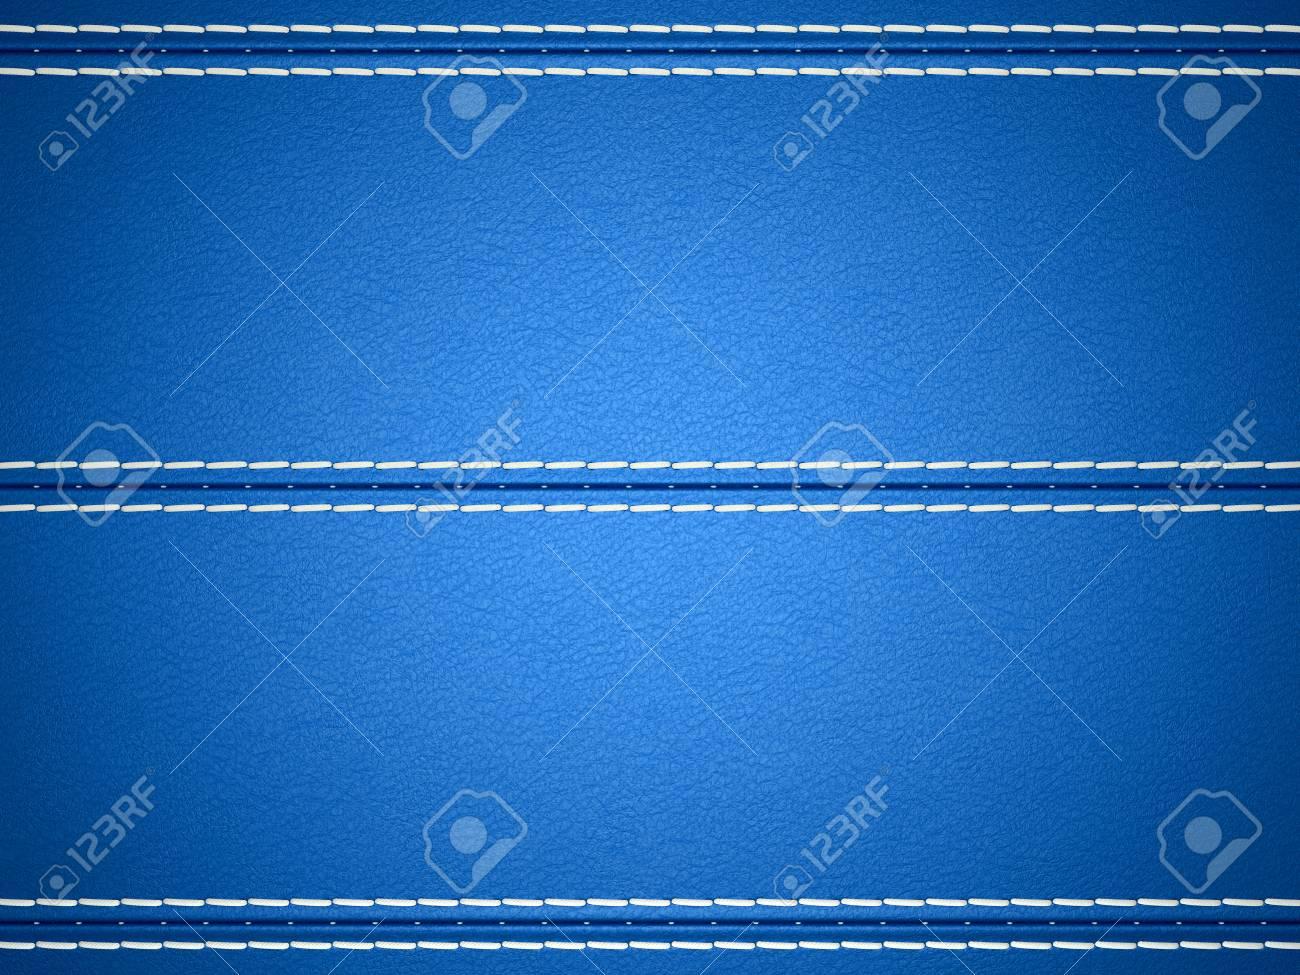 Blue horizontal stitched leather background. Large resolution Stock Photo - 9404840